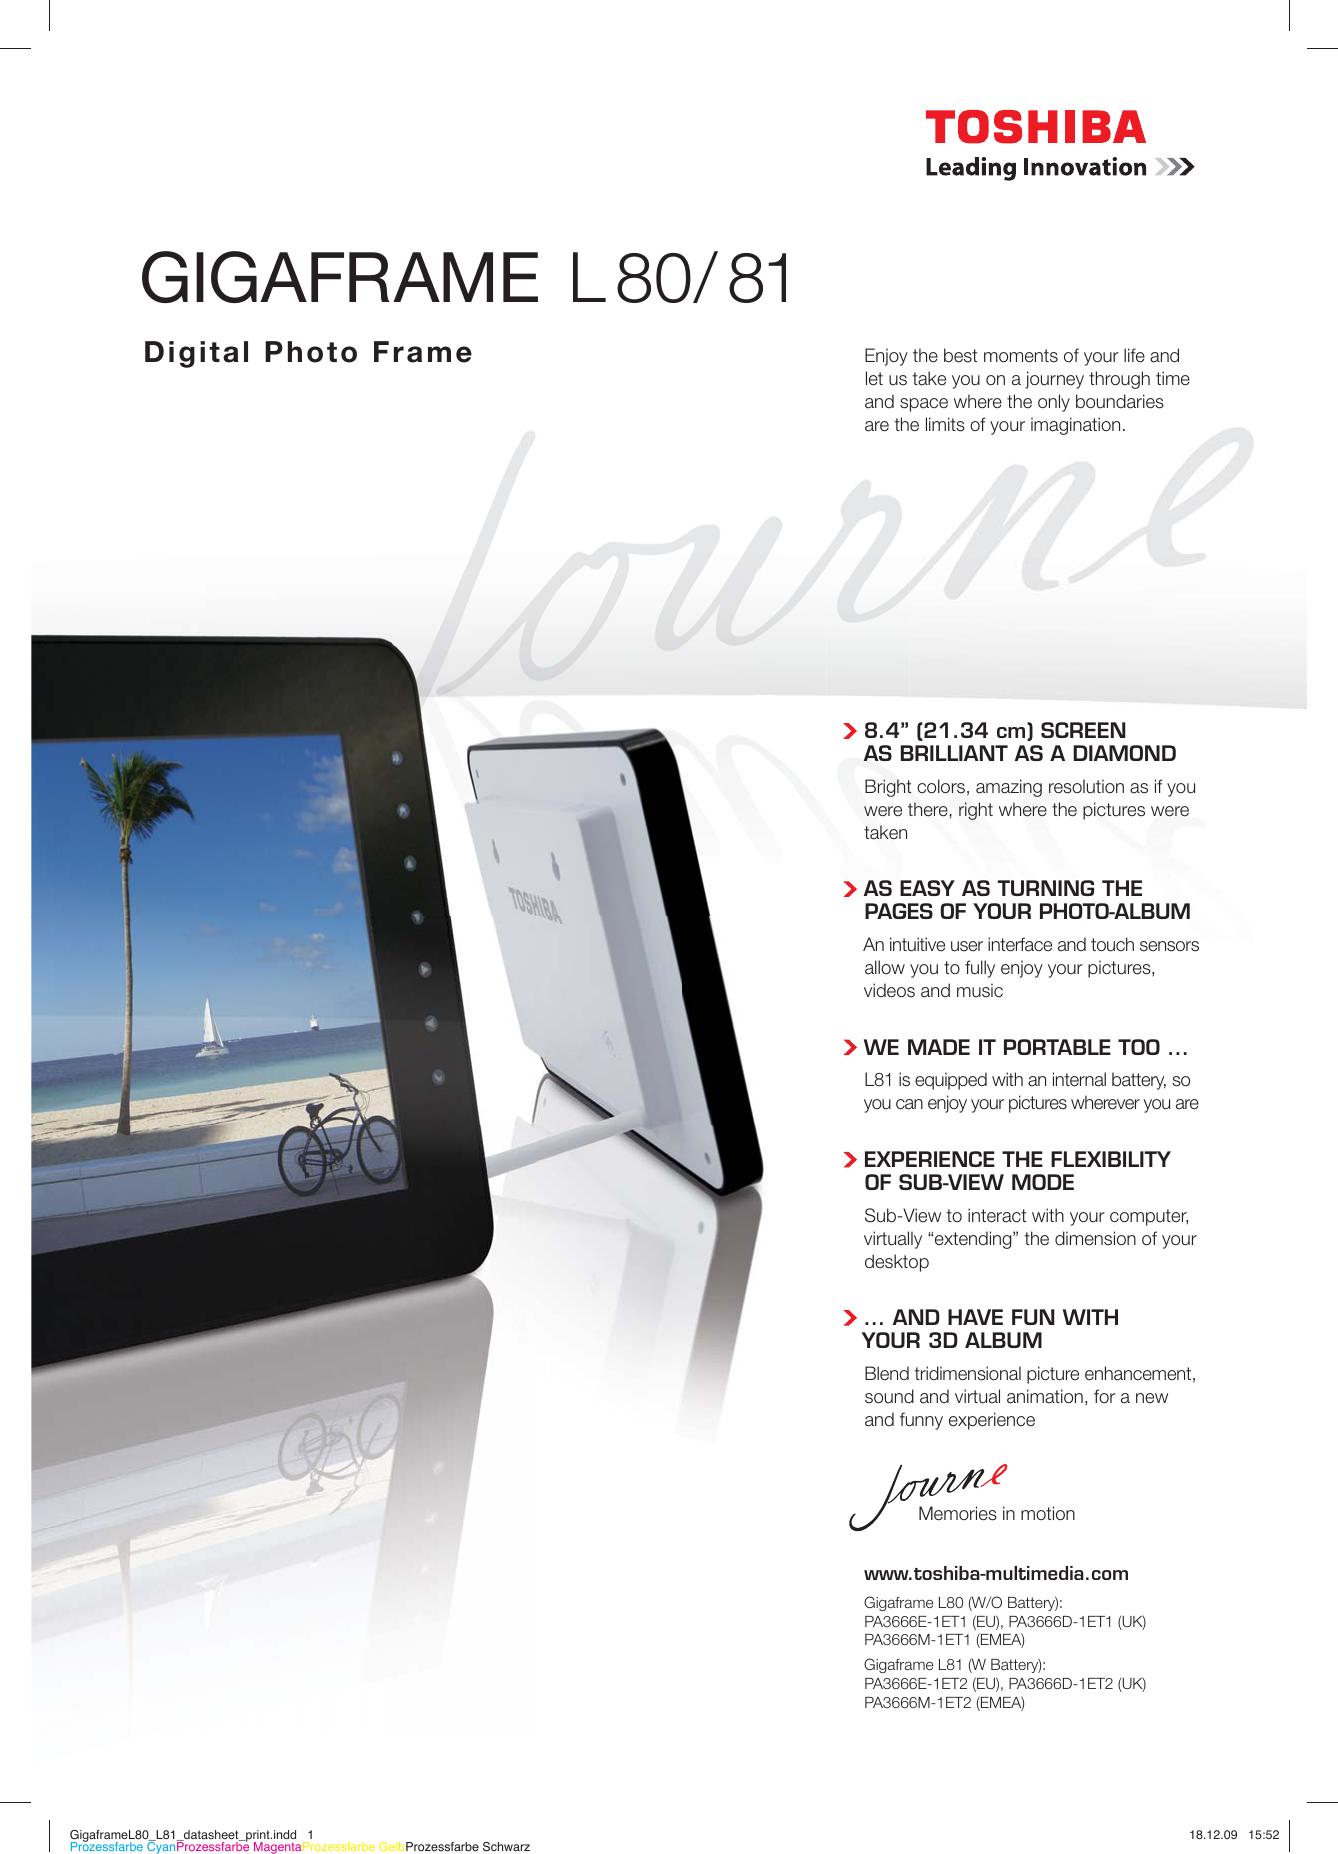 Toshiba Gigaframe L80 Users Manual Gigaframel80l81datasheetprint